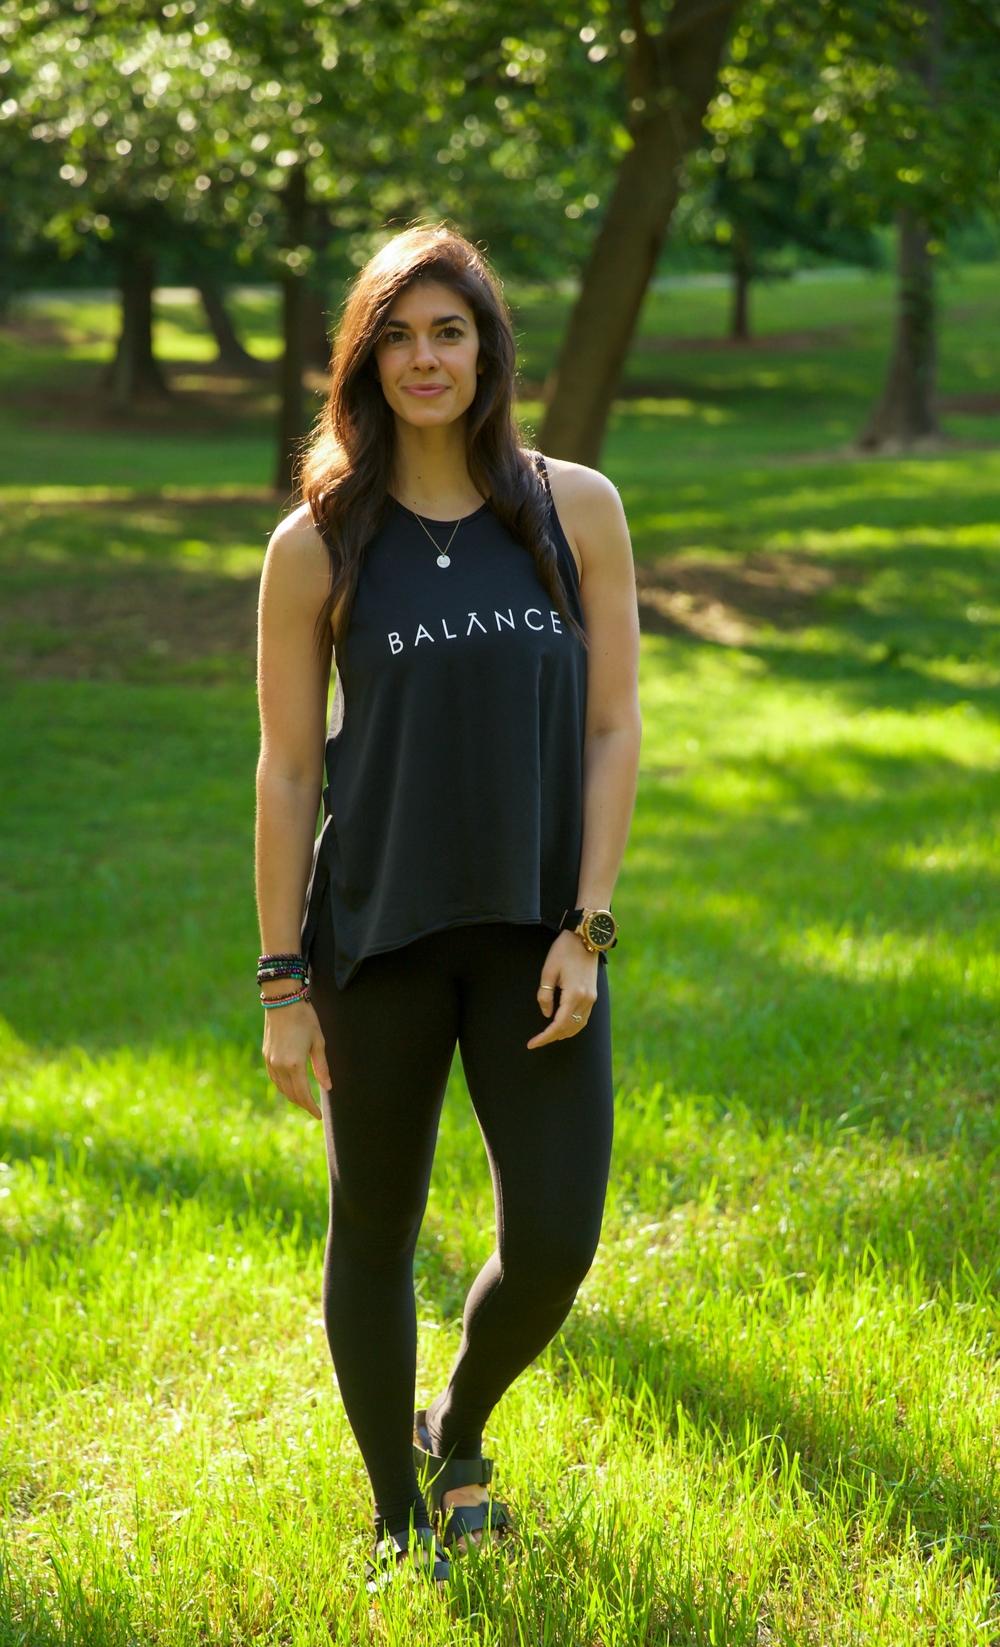 LaurenSchwaiger-Healthy-Life-Style-Blog-Balance-Tank-Peace-Love-World.jpg